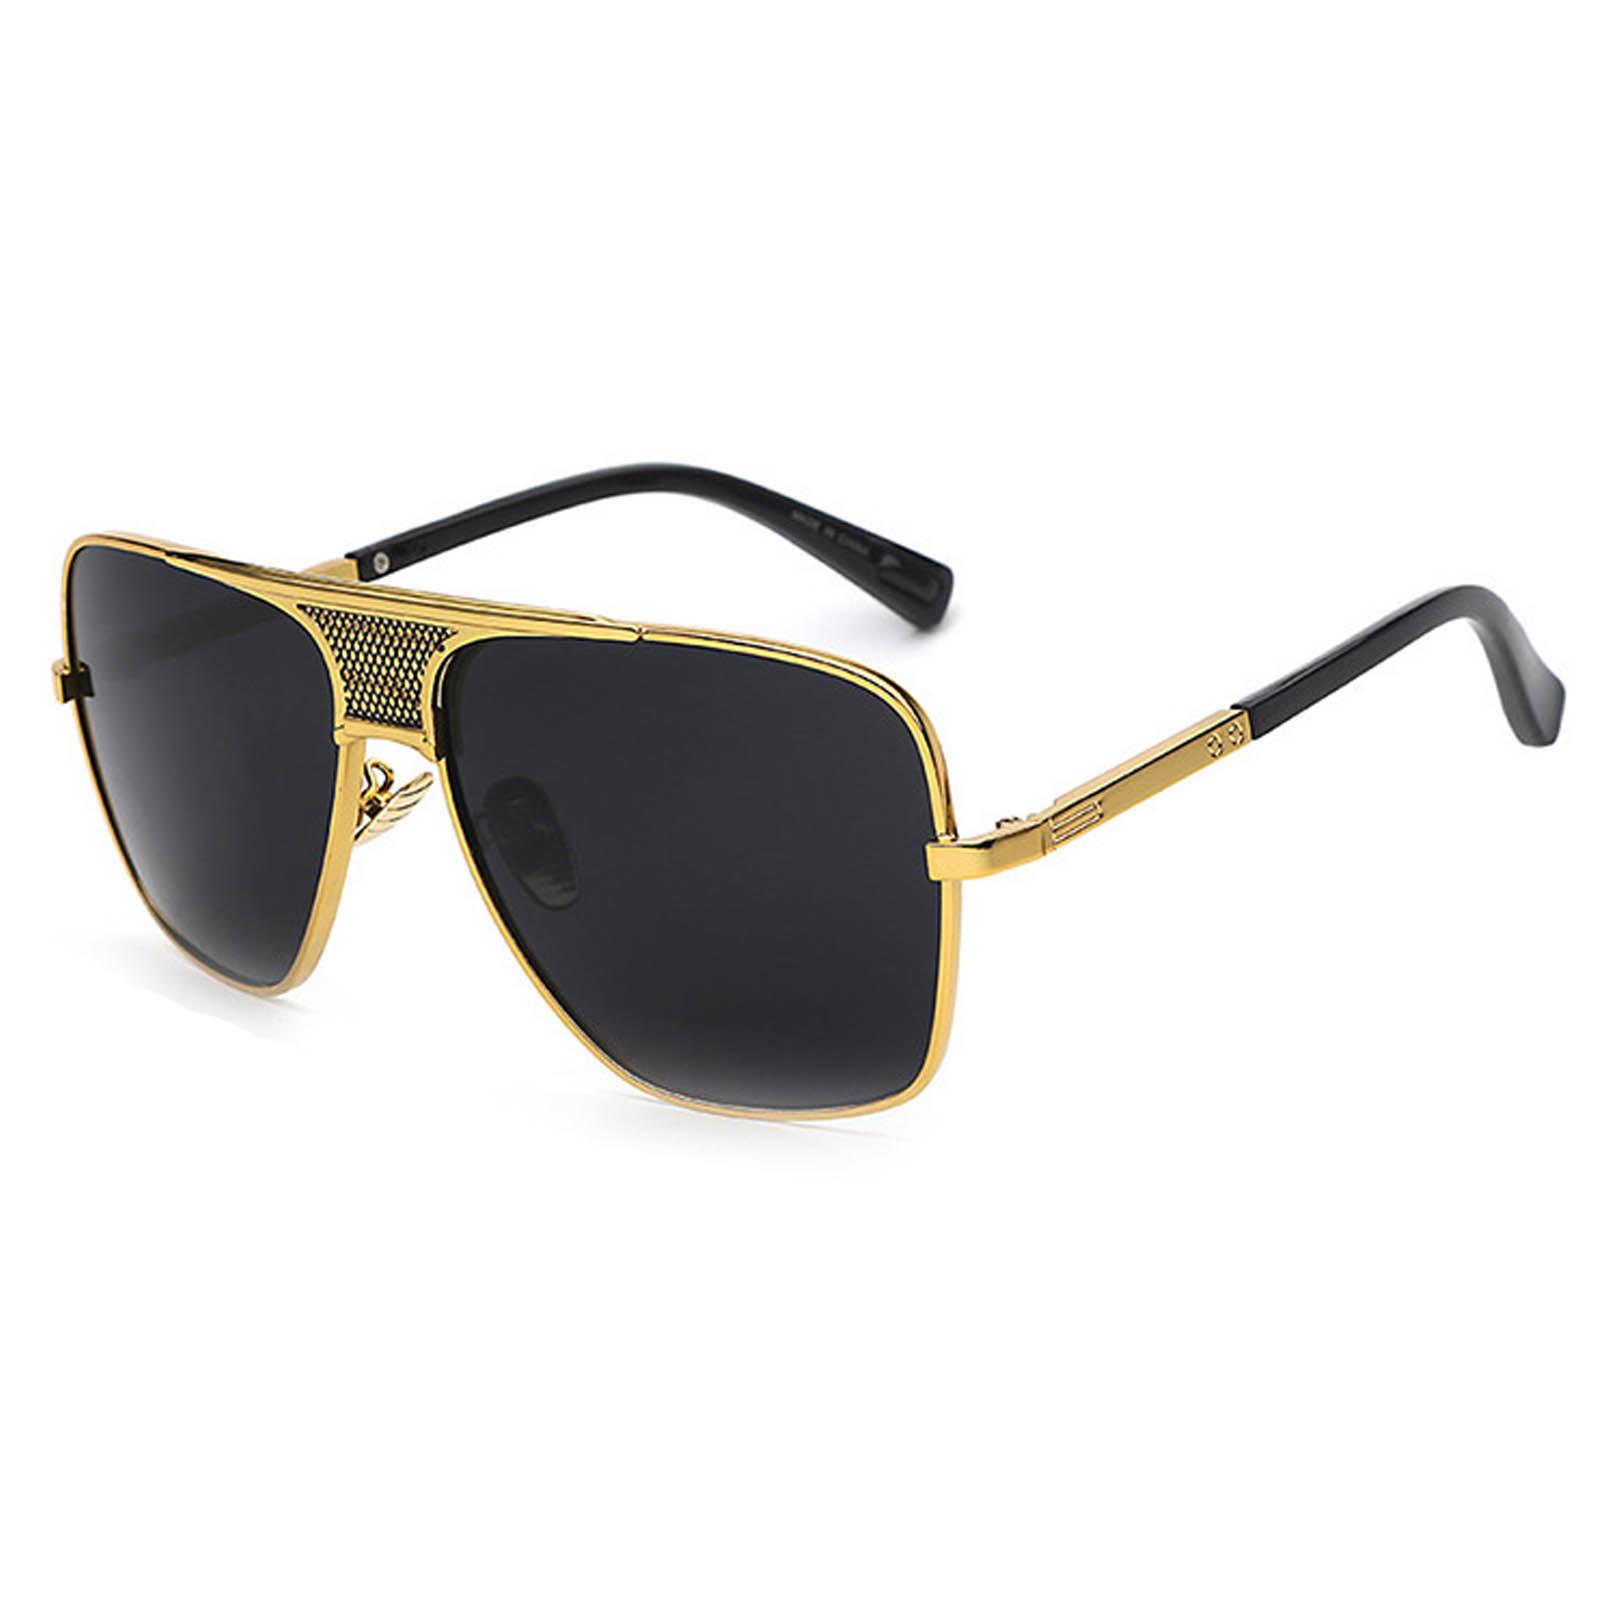 OWL ® 013 C1 Square Eyewear Sunglasses Women's Men's Metal Black Frame Black Lens One Pair